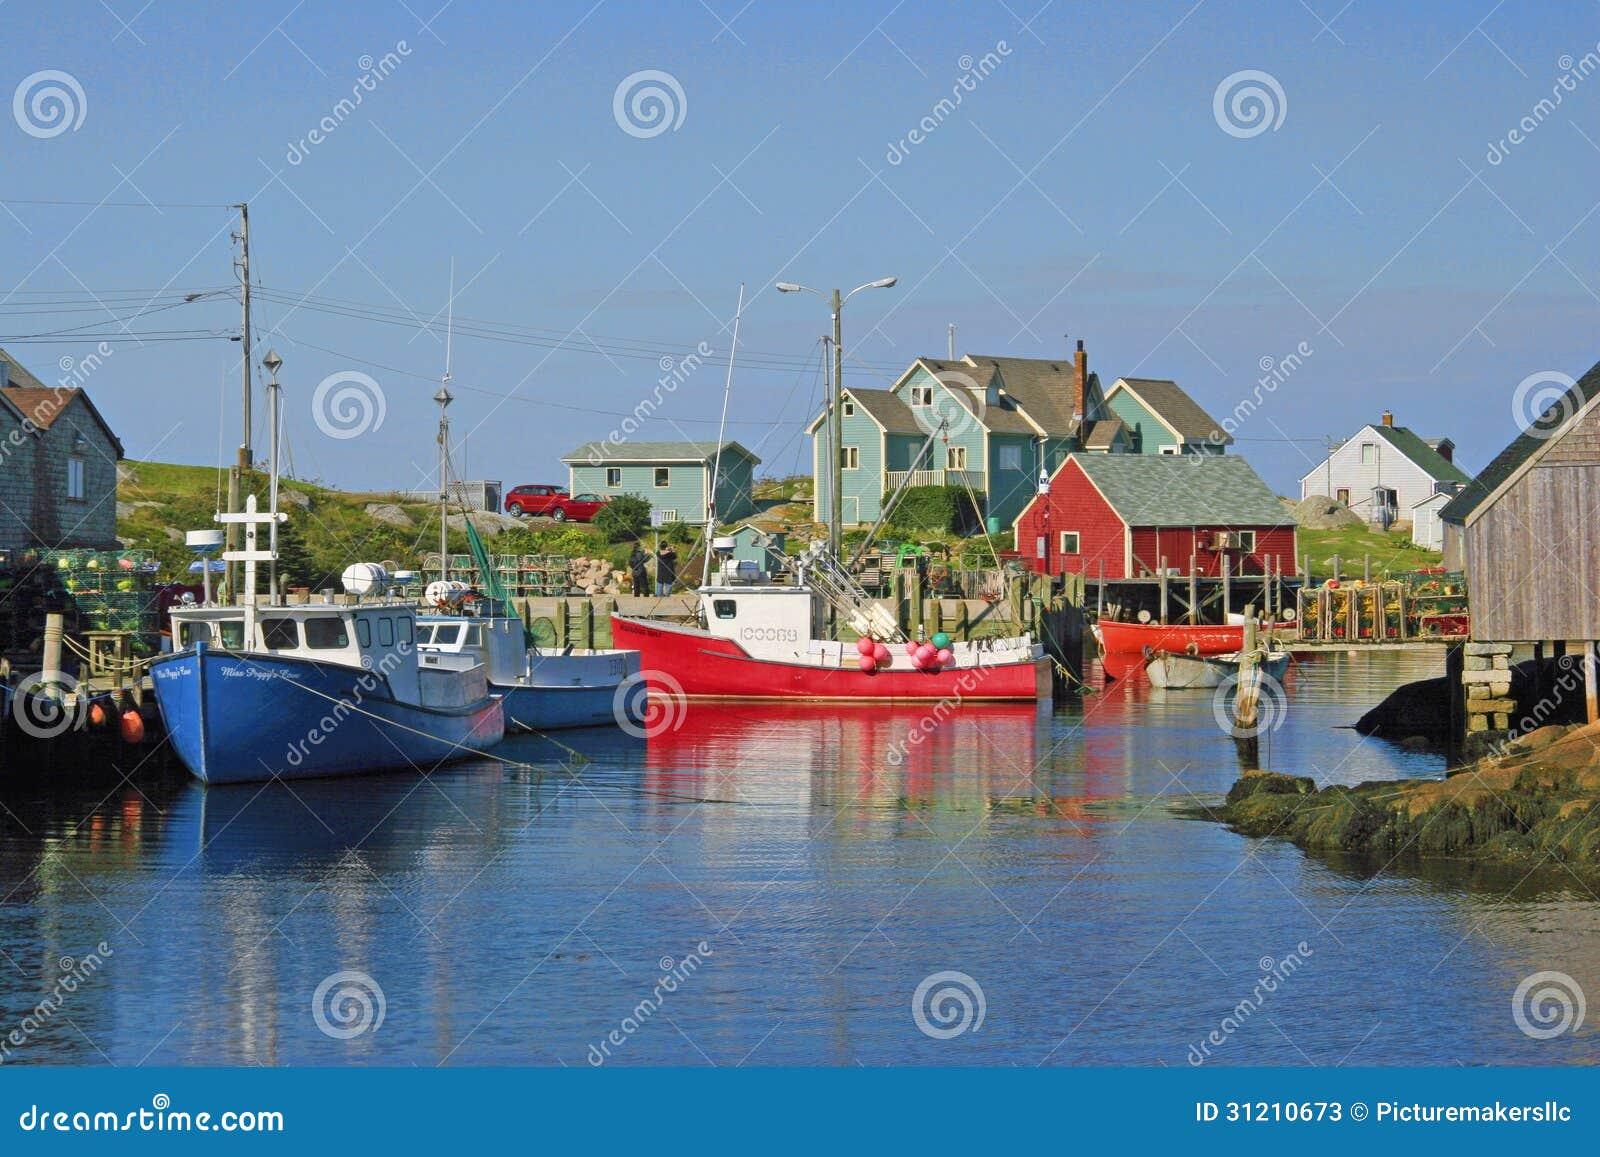 Peggys cove editorial stock photo image 31210673 for Nova scotia fishing